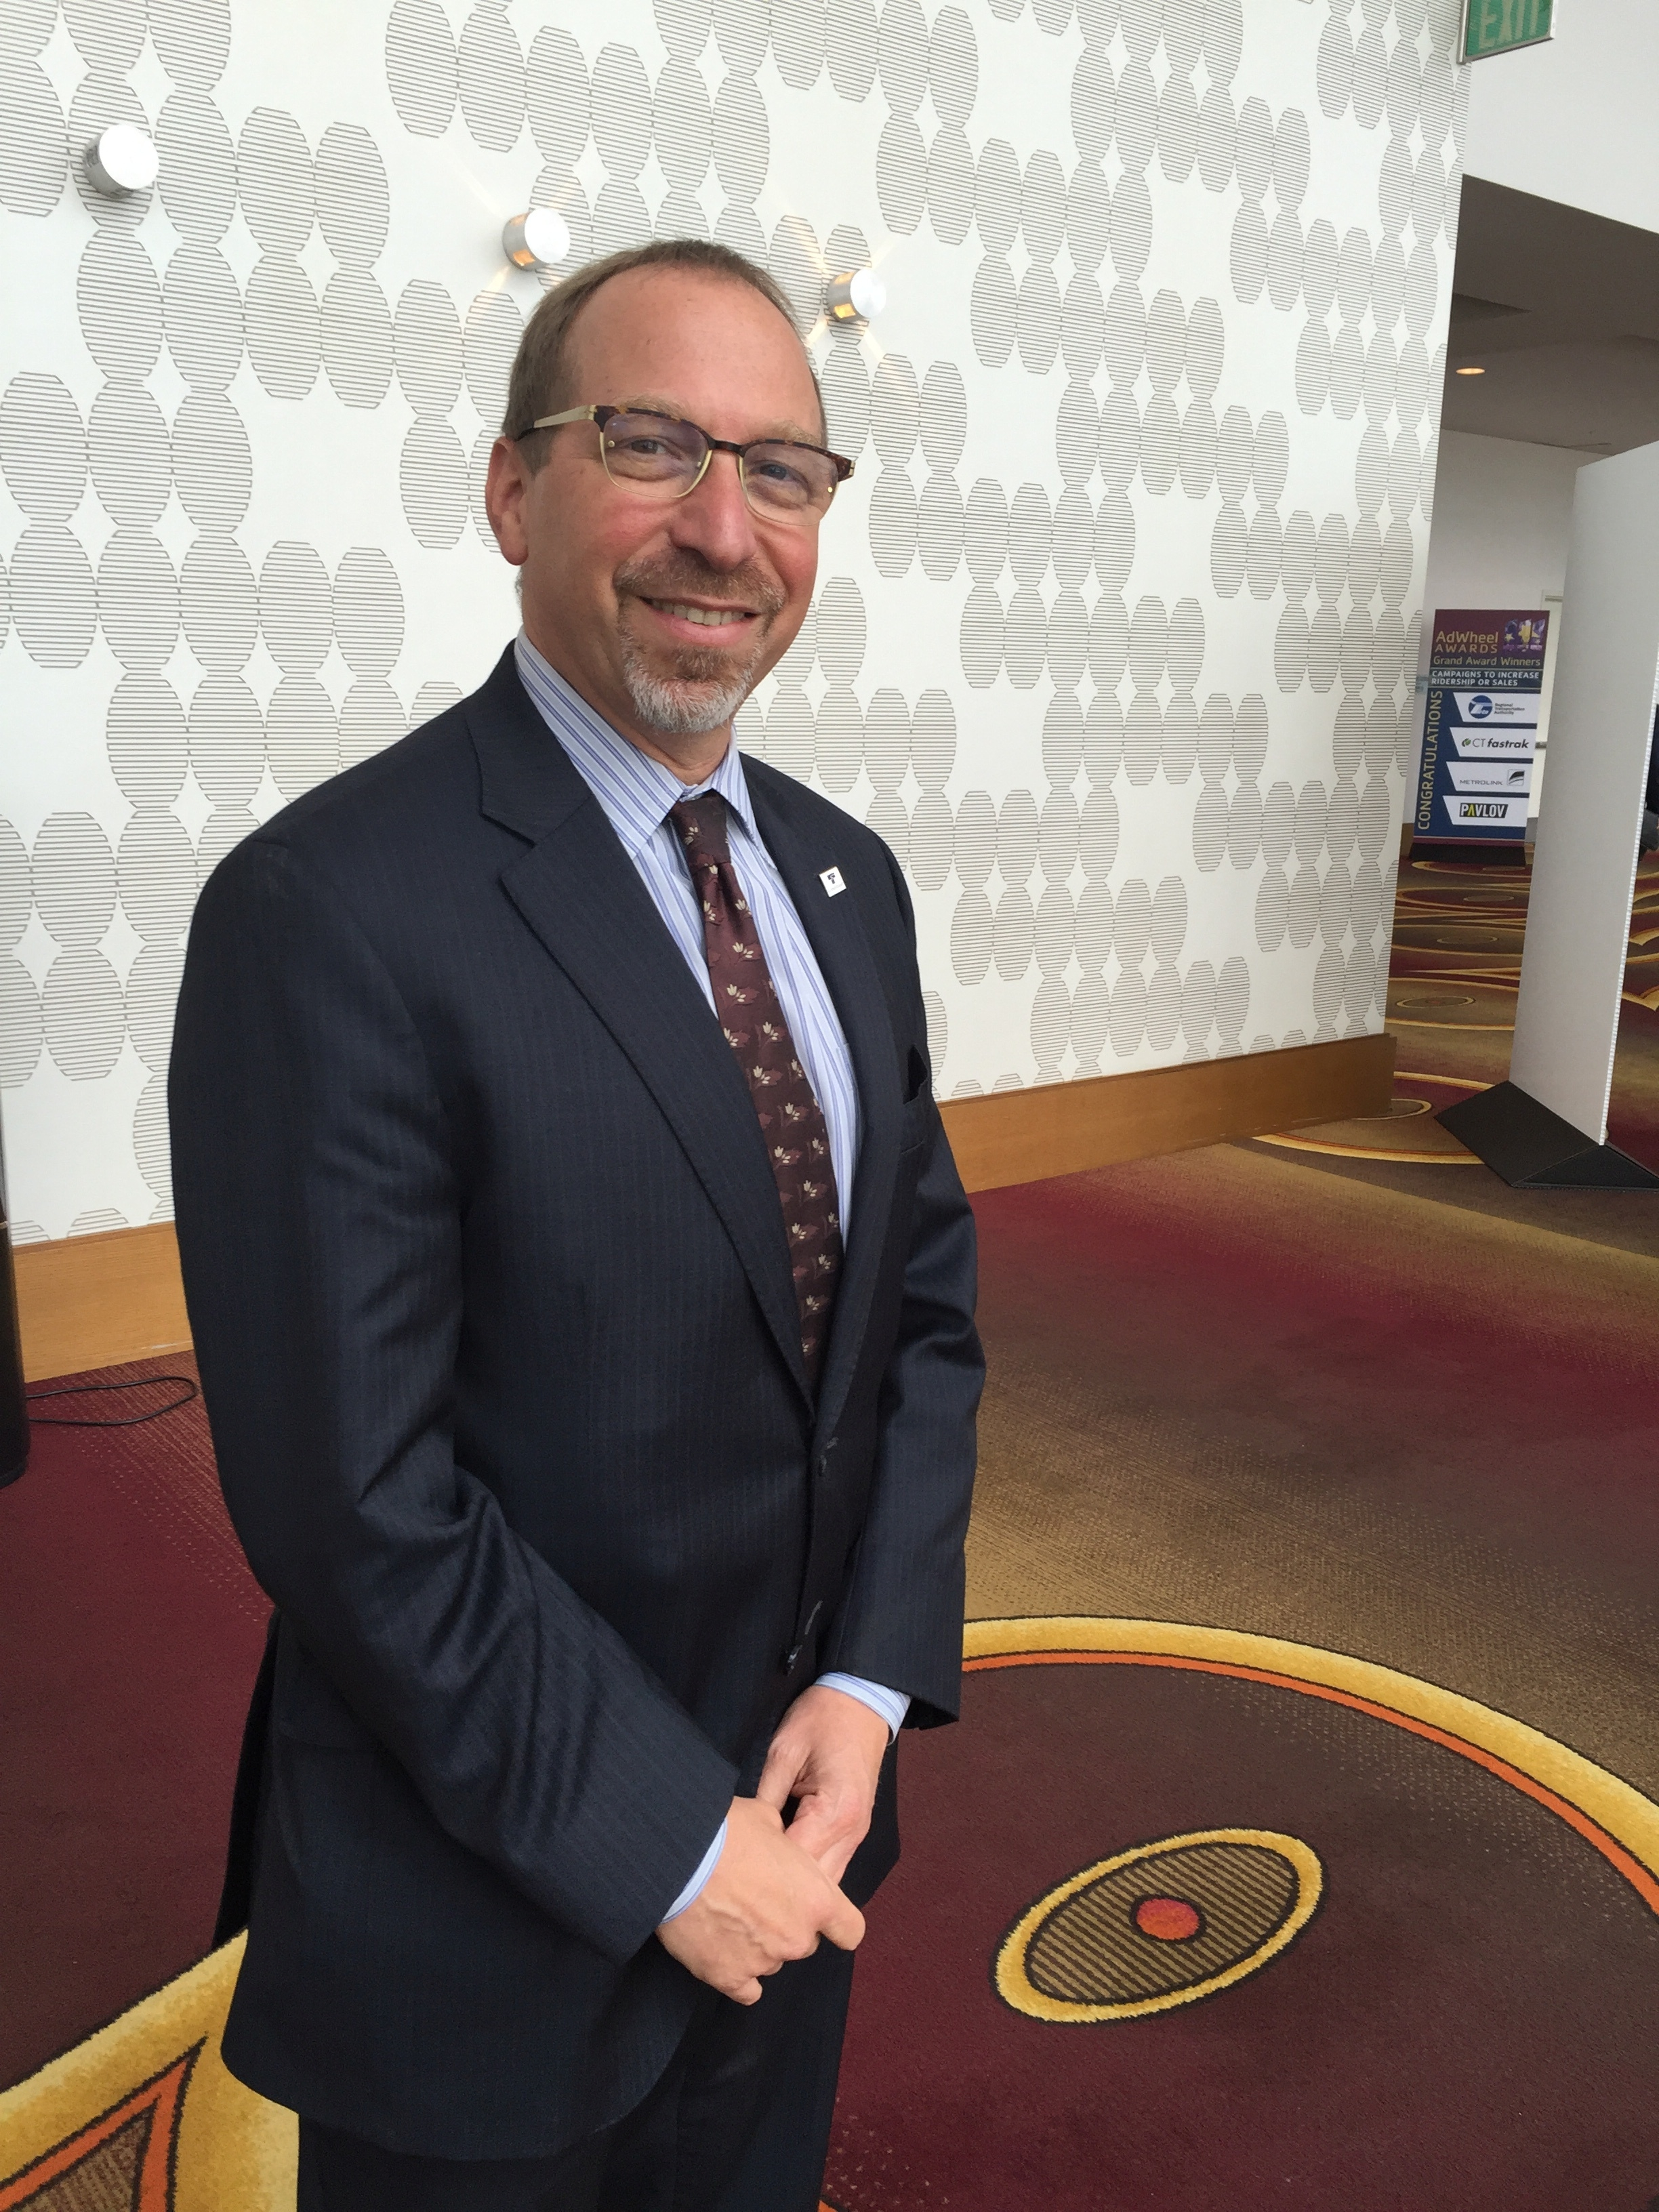 Sound Transit's Rogoff to Depart in 2022